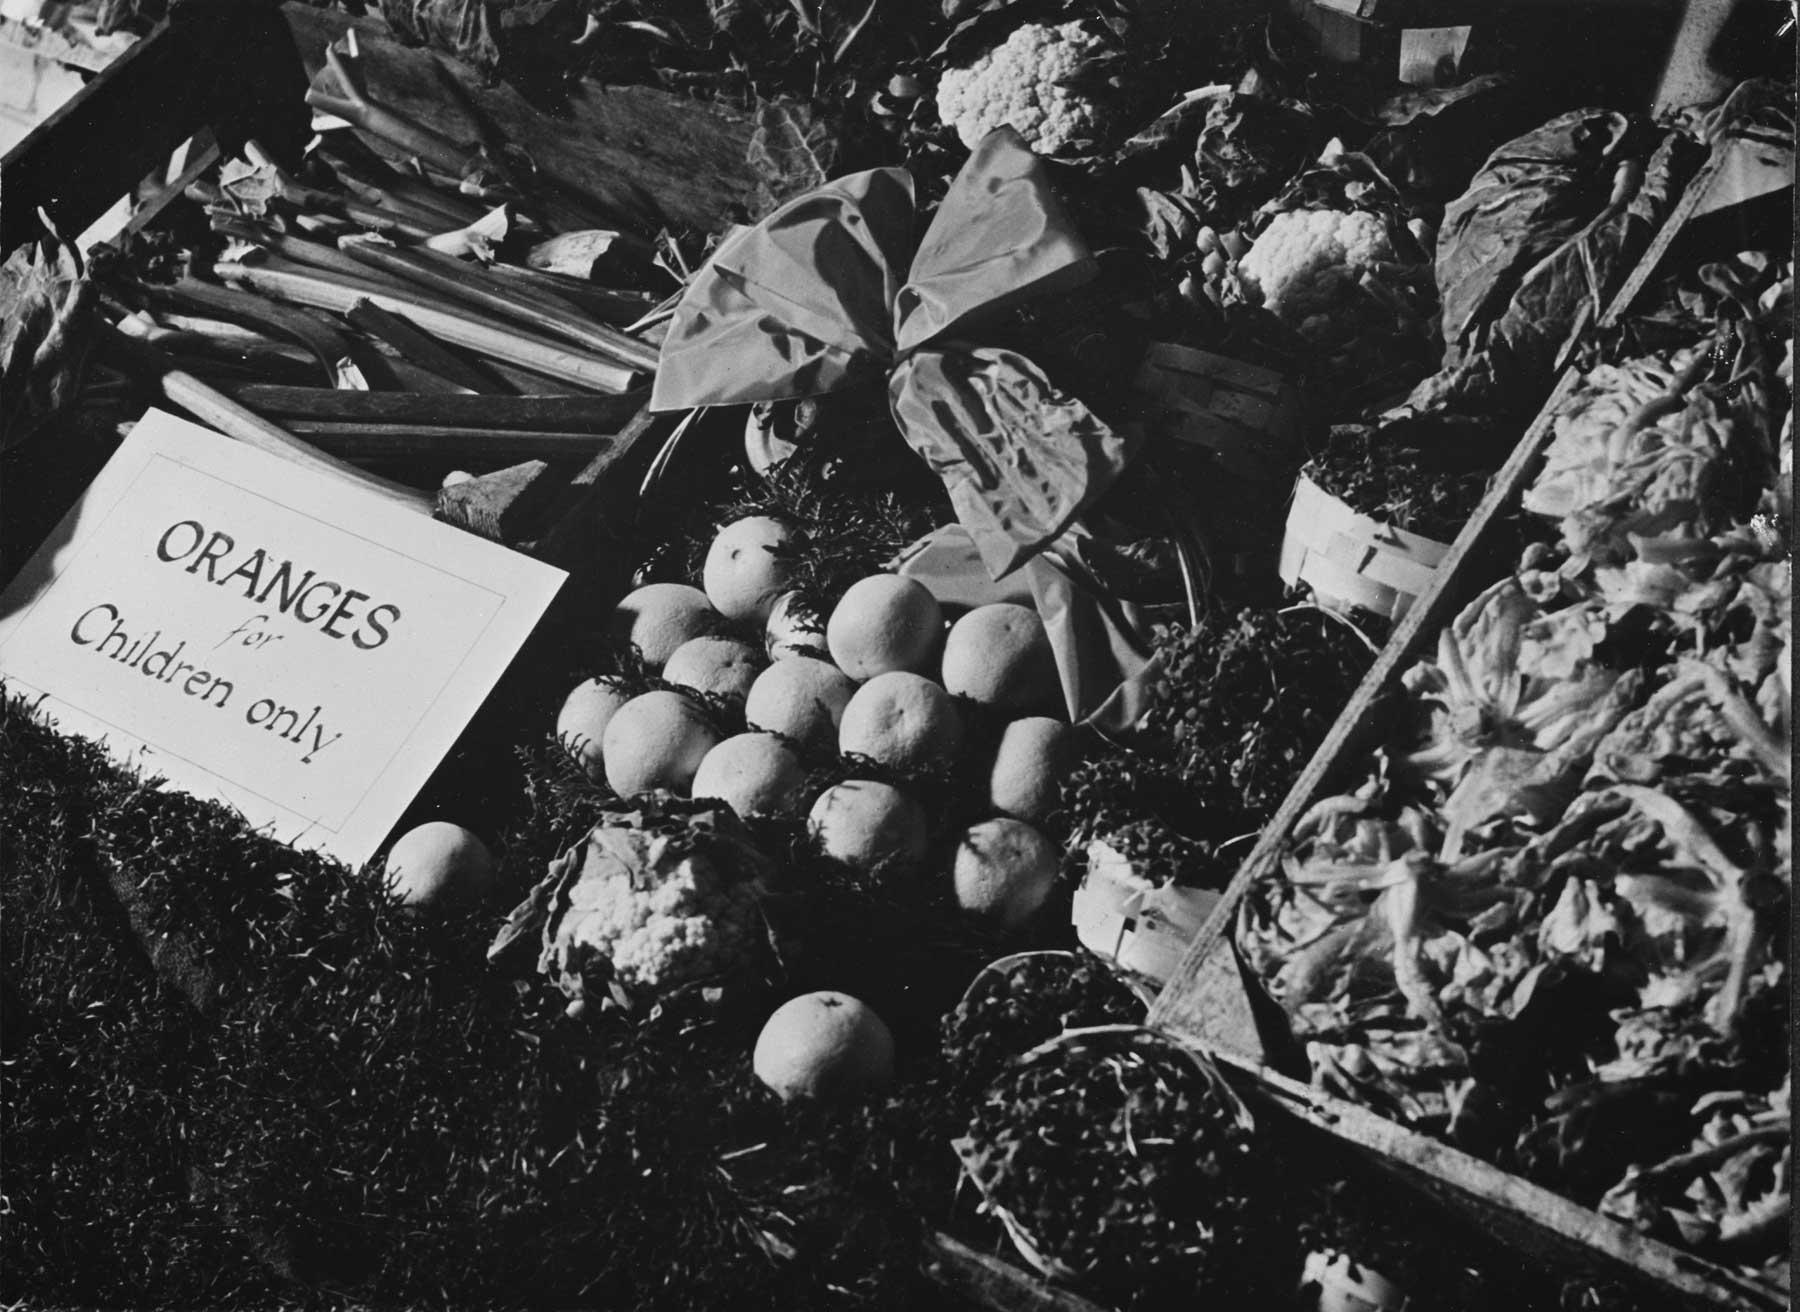 Oranges on restricted sale for children only